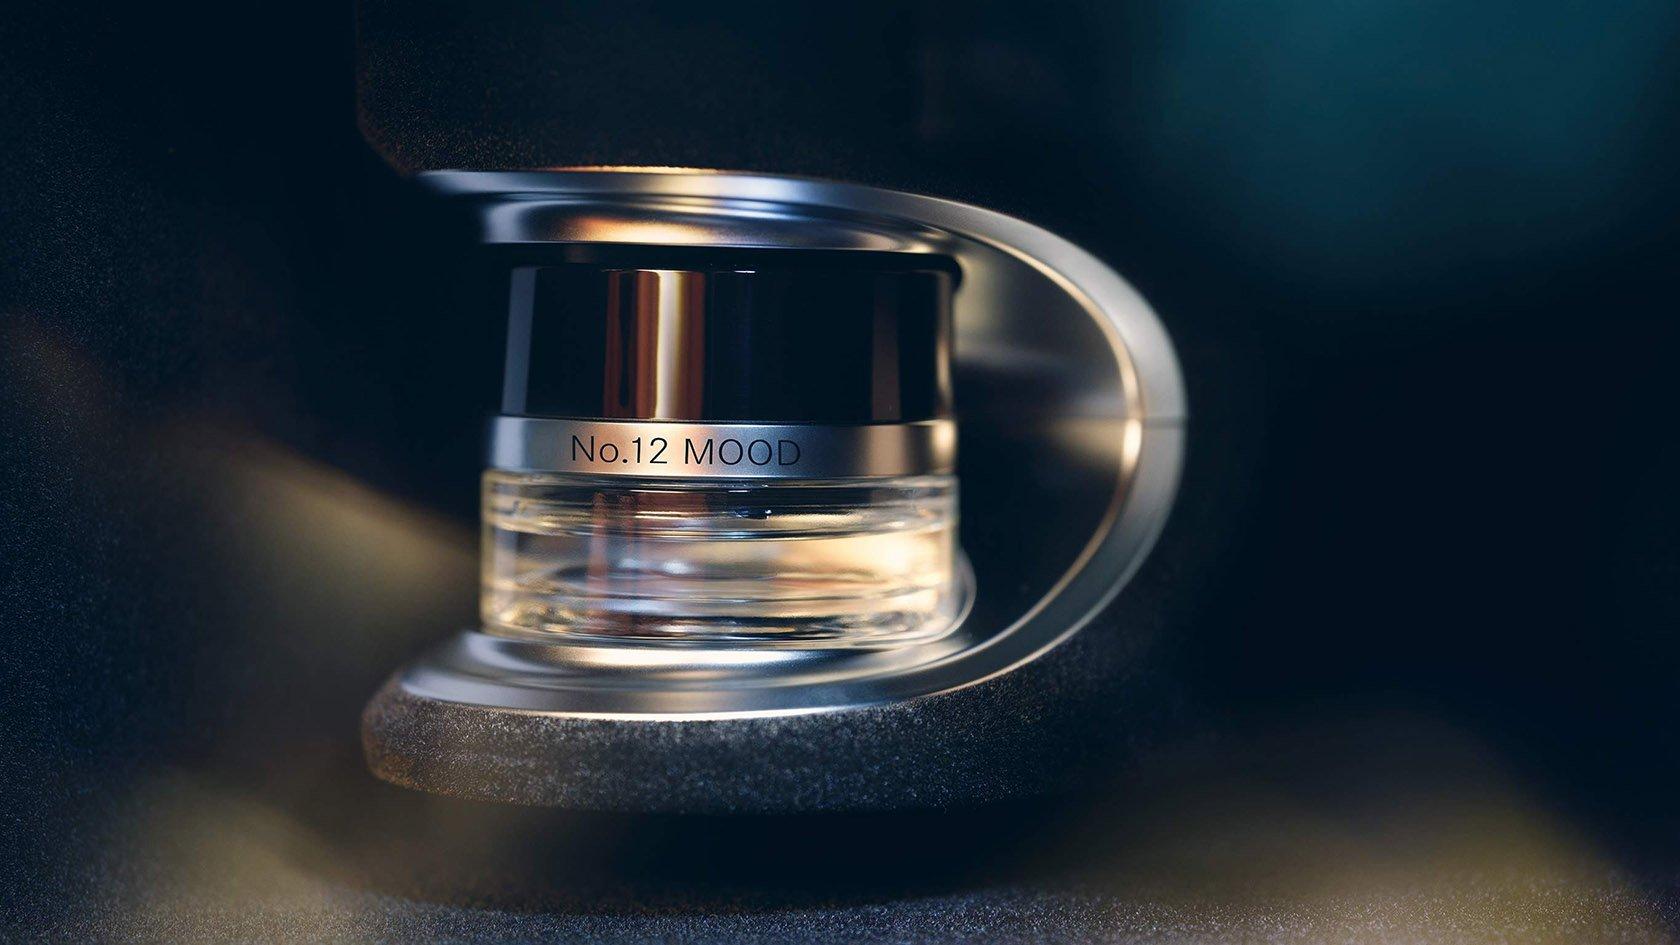 Ексклюзивний аромат Mercedes-Maybach № 12 MOOD